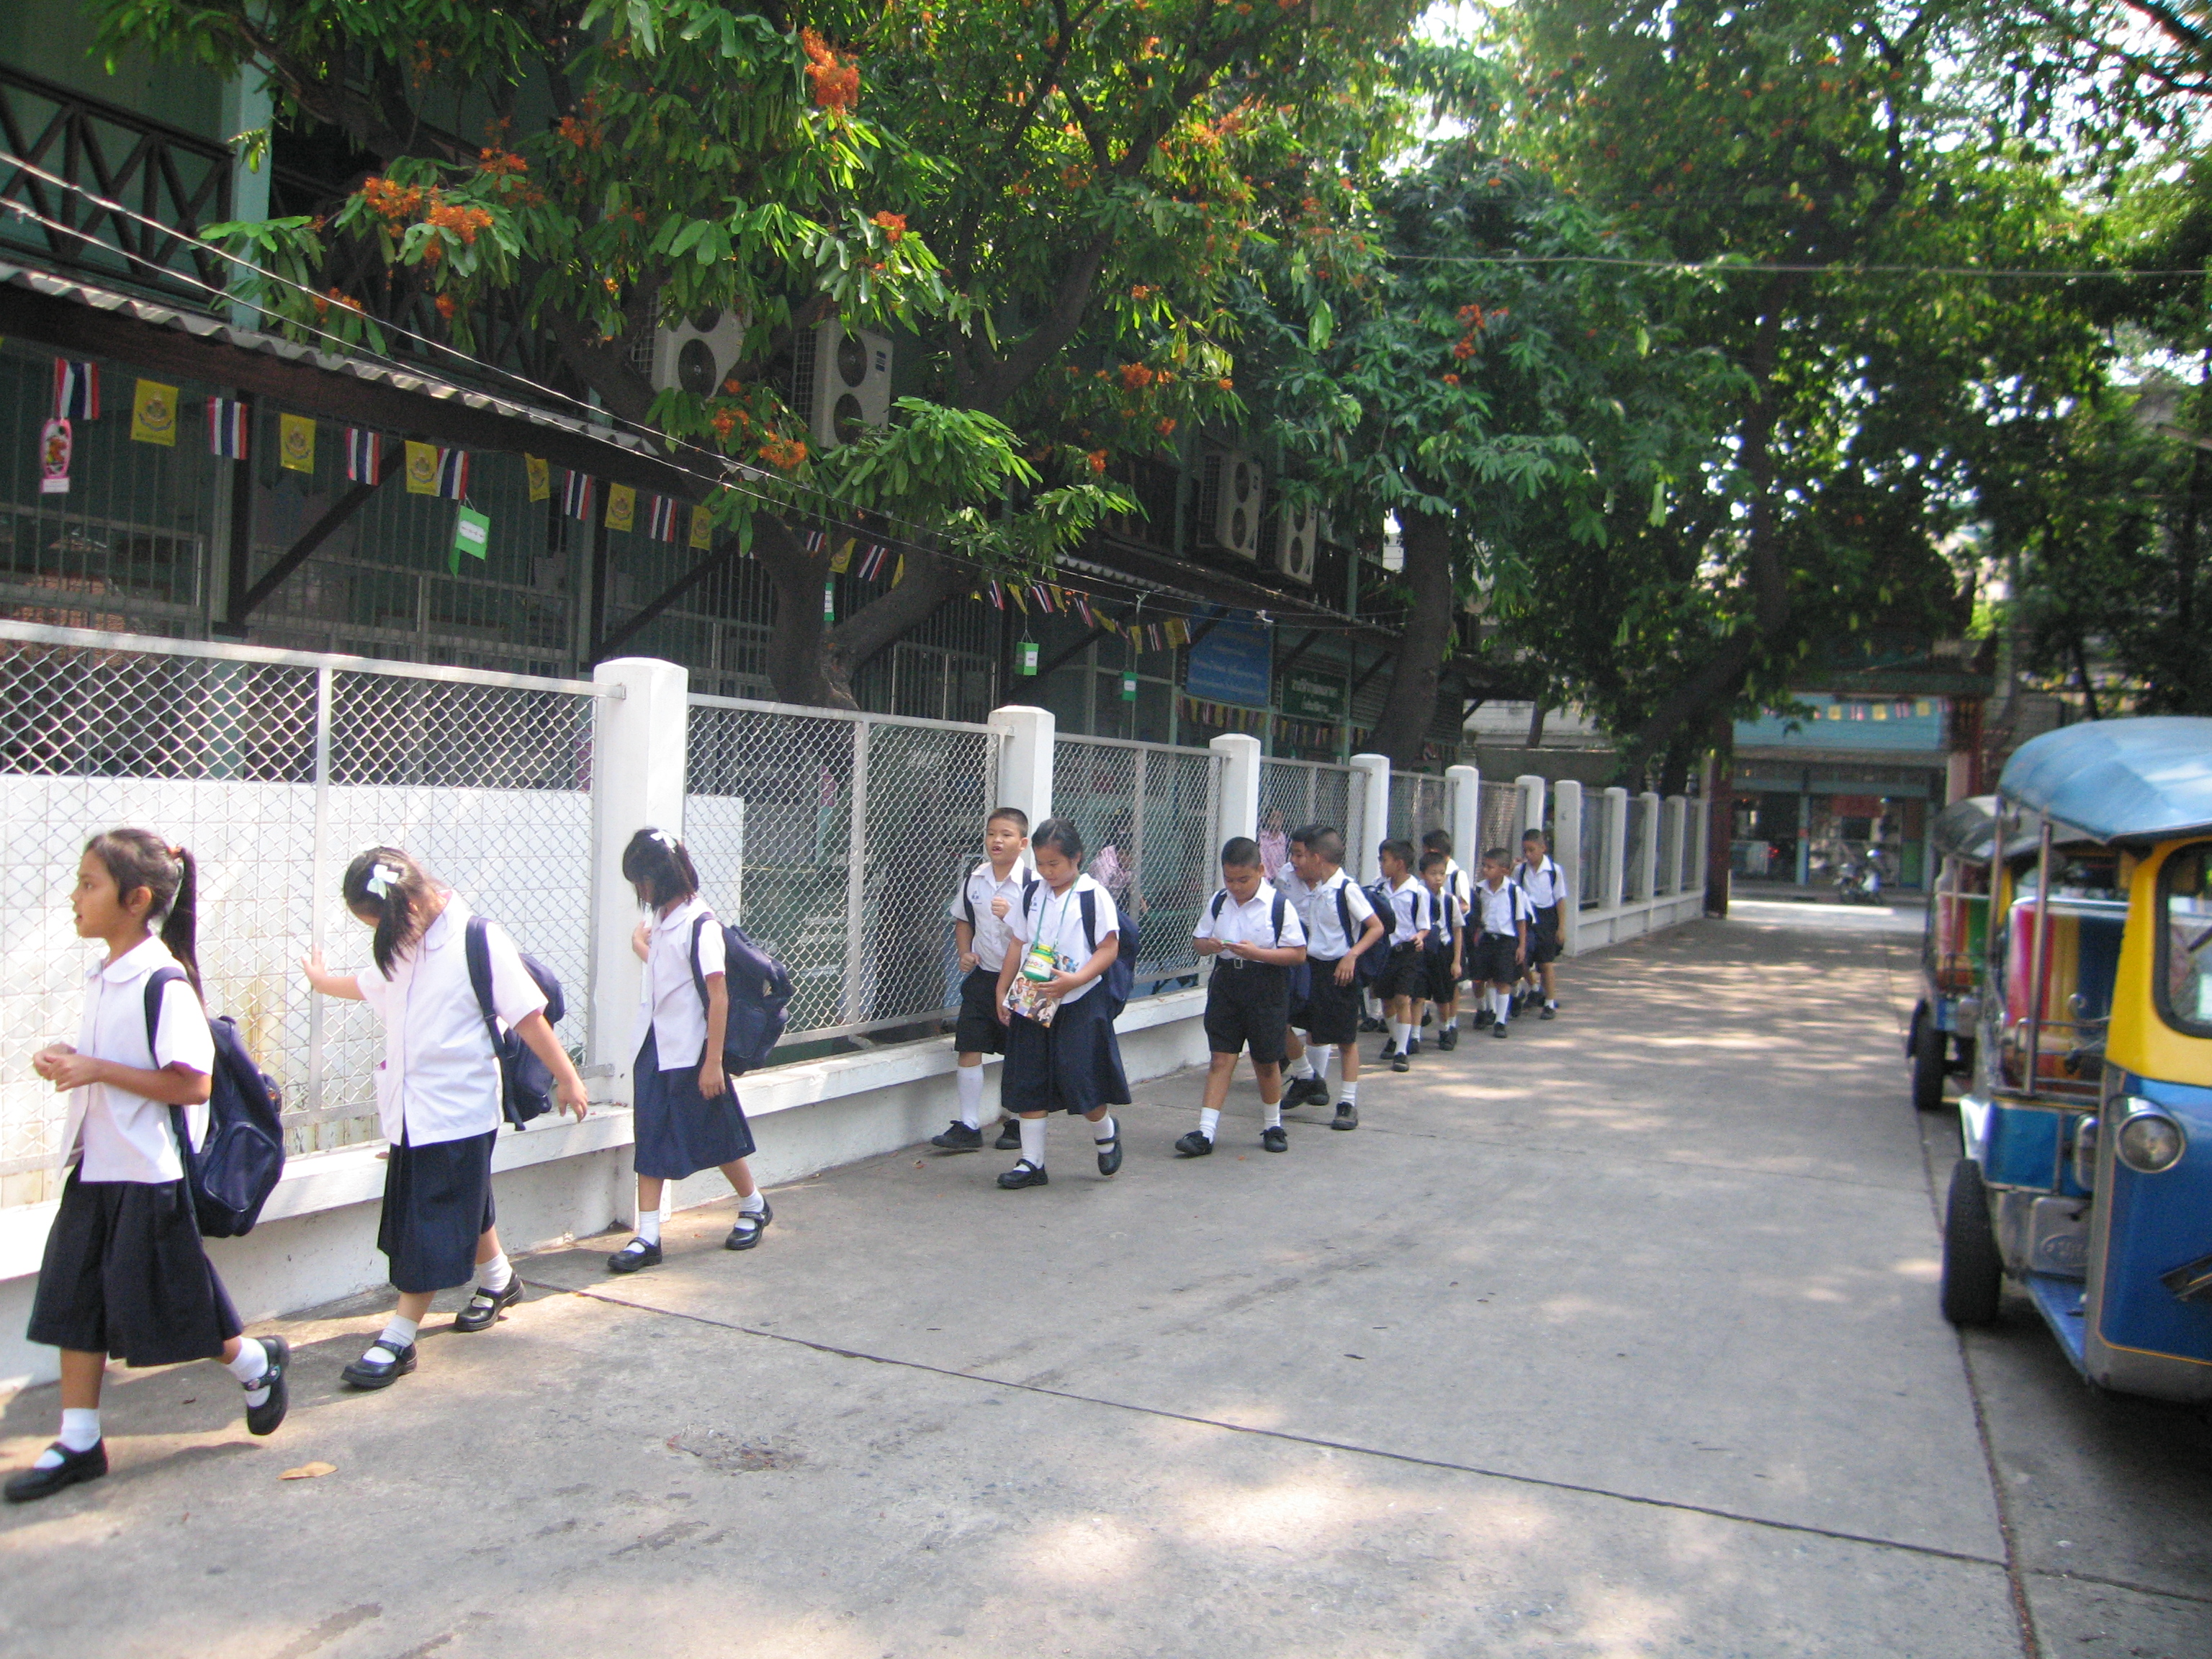 thailand education เรียนศัพท์ภาษาอังกฤษพร้อมความหมายของคำเหล่านี้ a range of,,achieve.